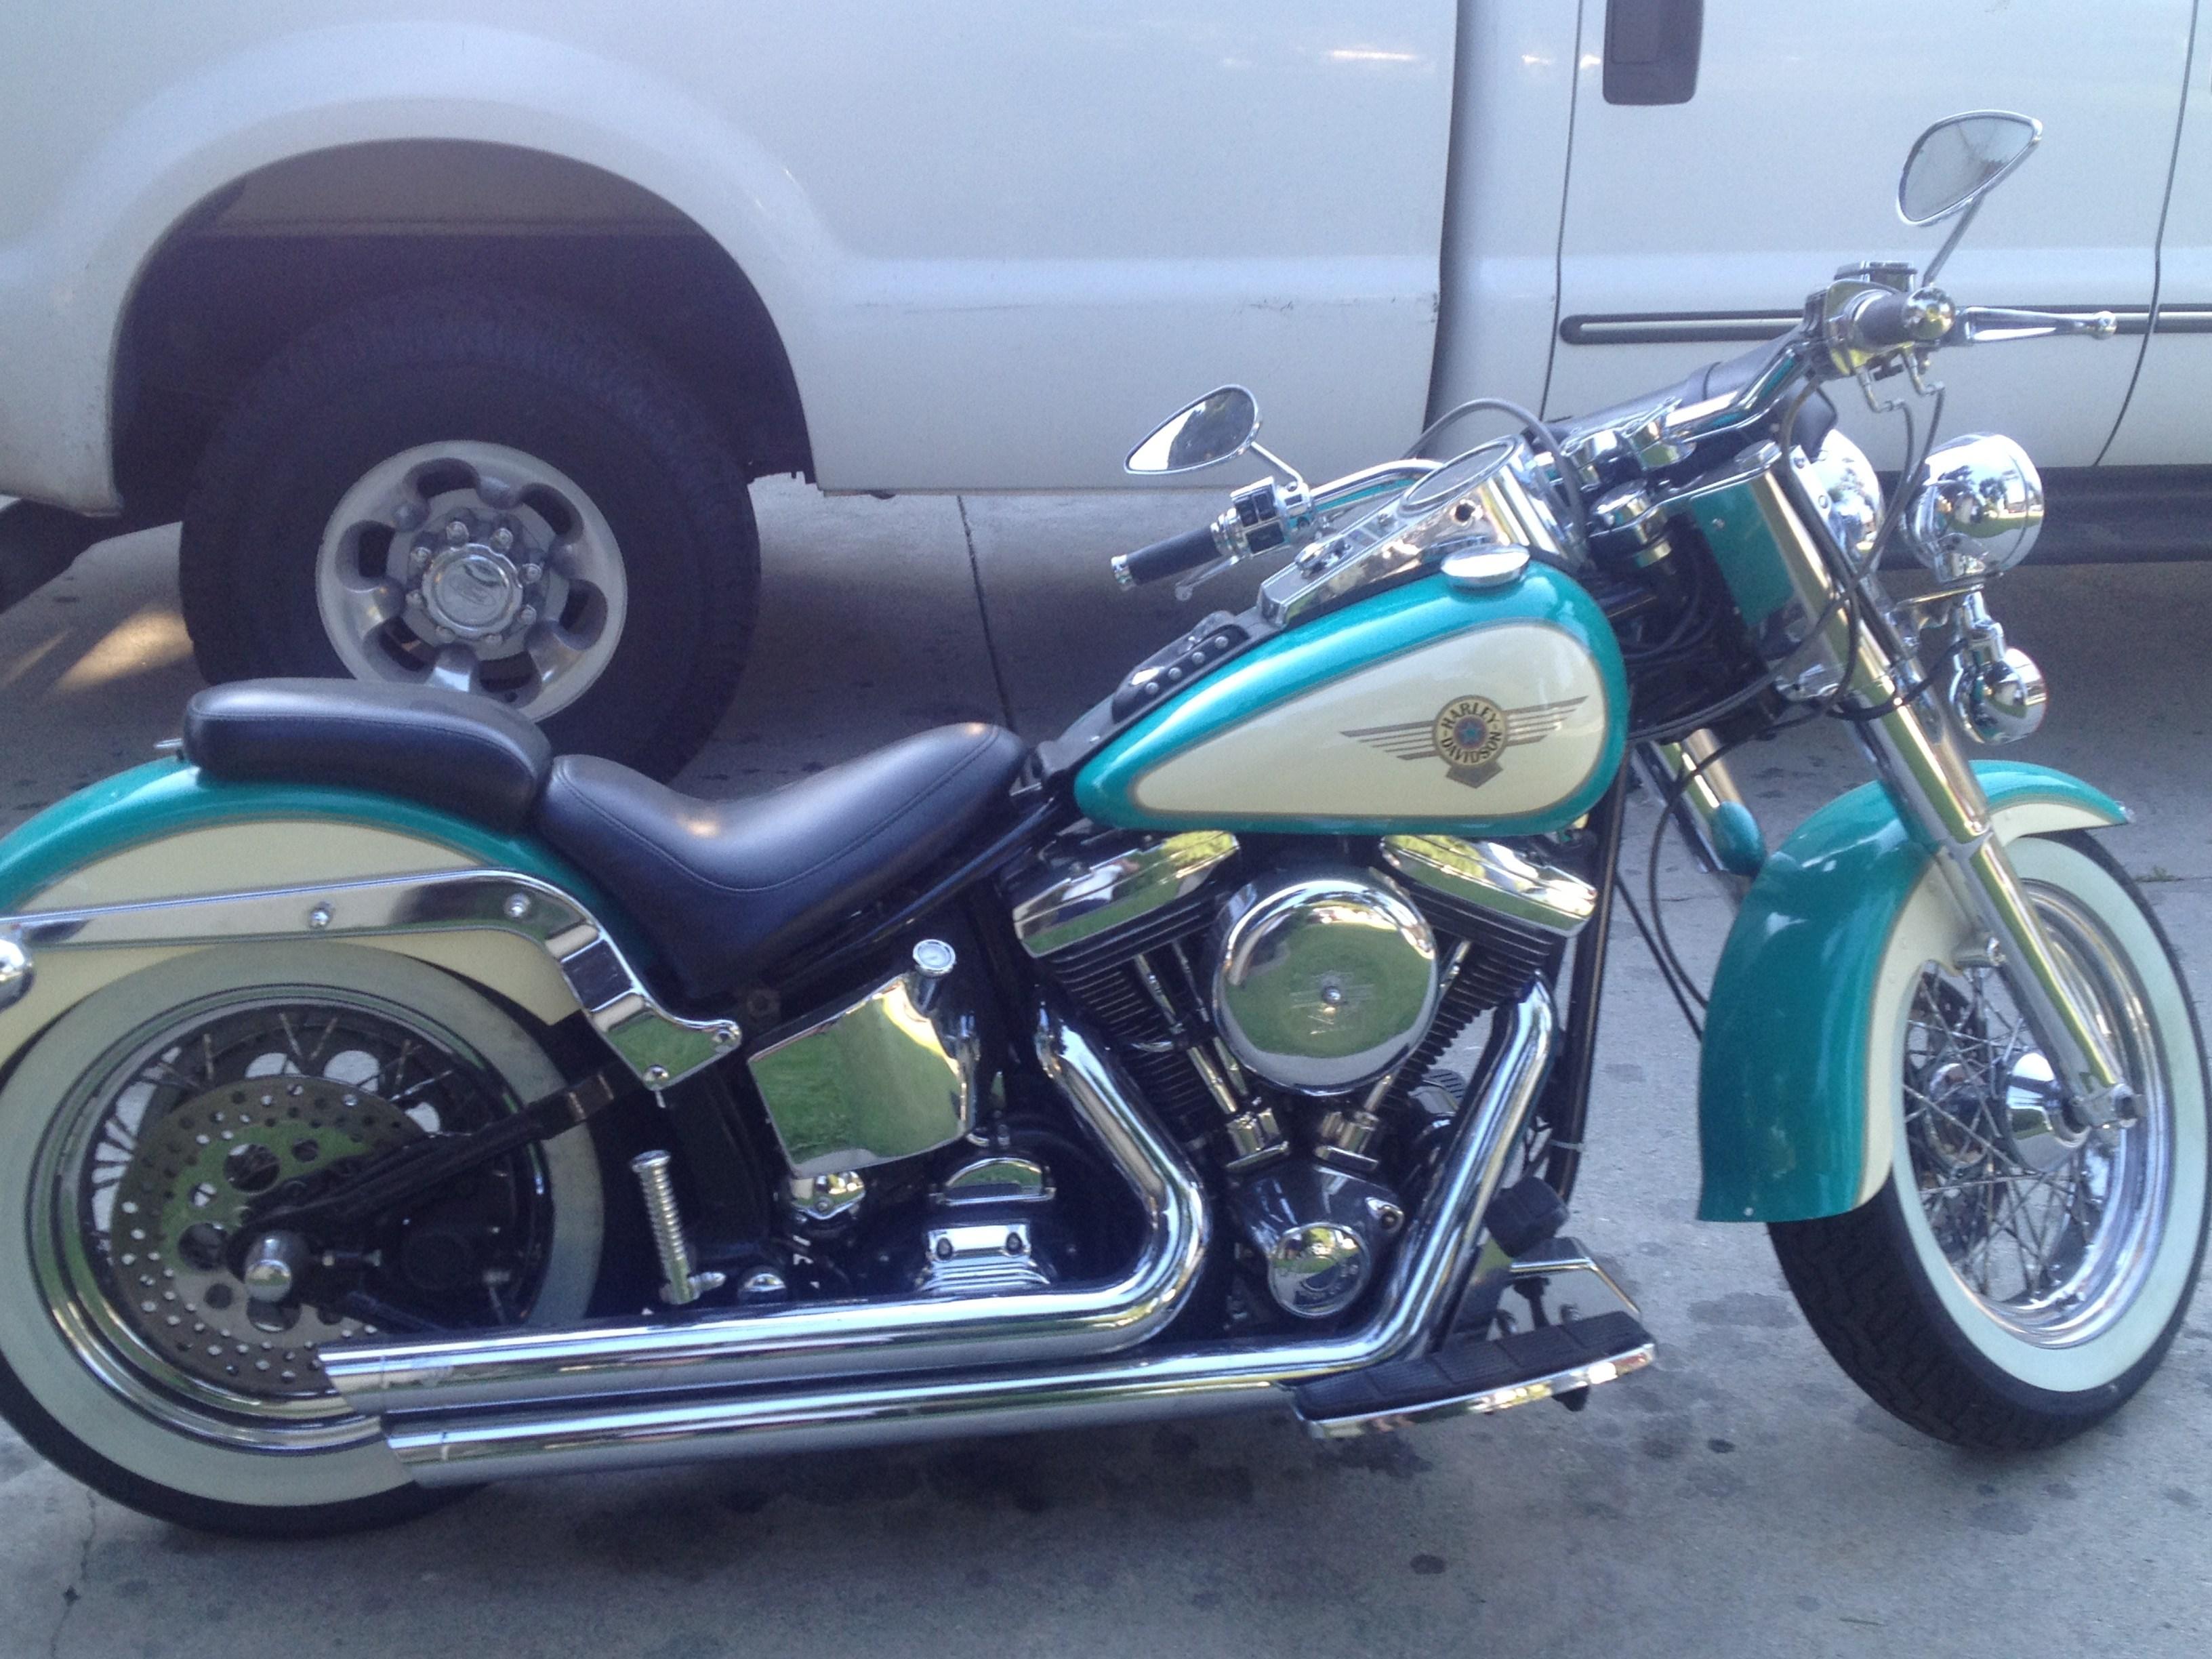 1997 Harley Davidson 174 Flstf Softail 174 Fat Boy 174 Teal White